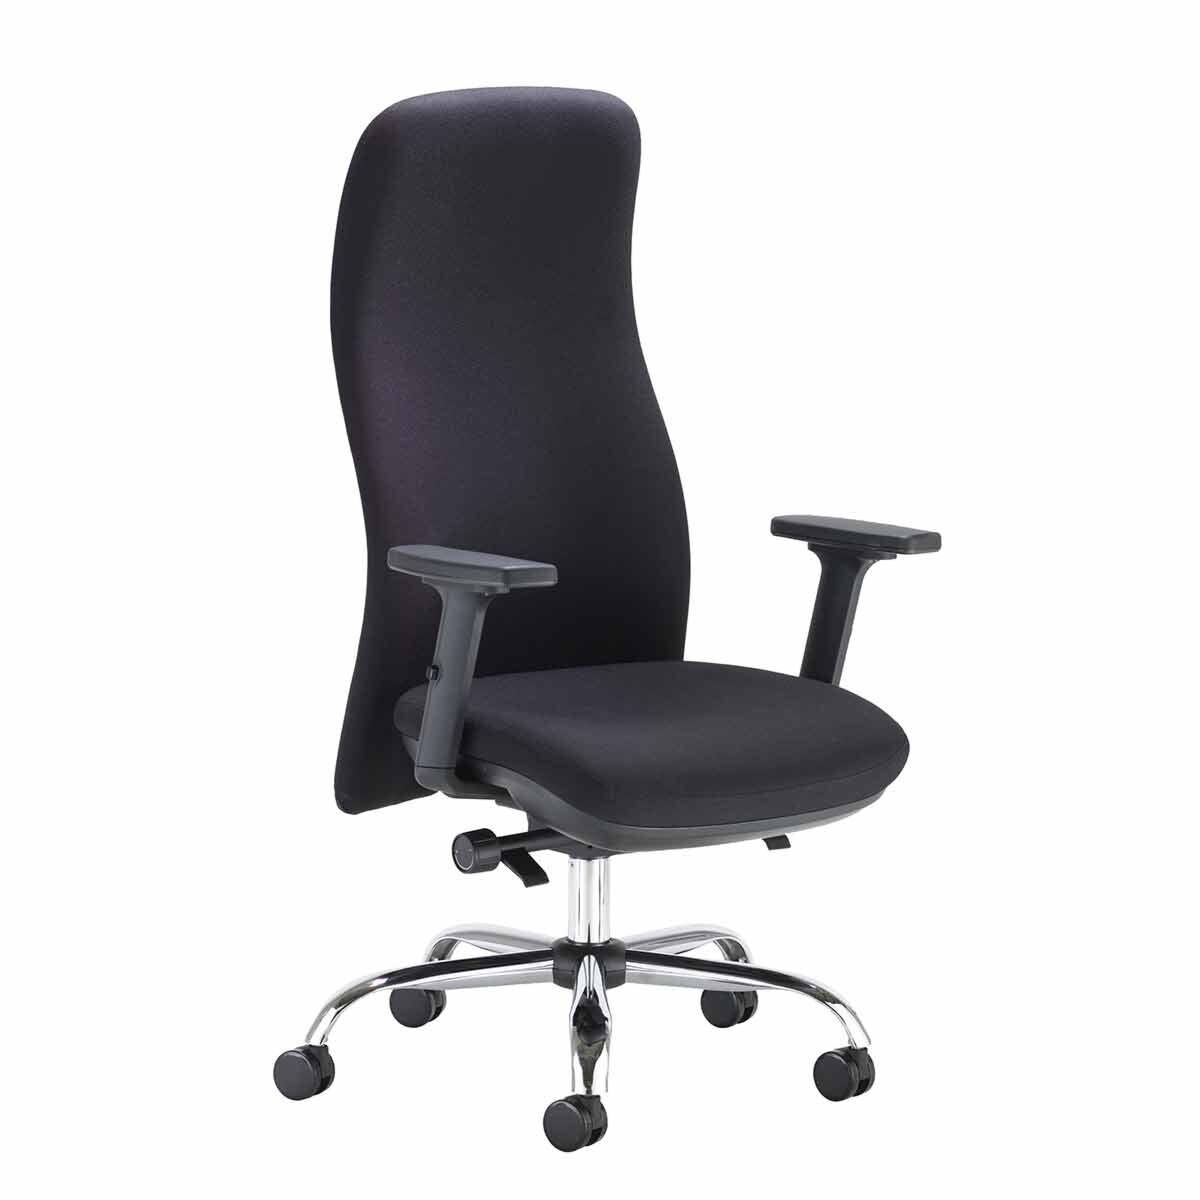 TC Office Ergonomic Posture Chair